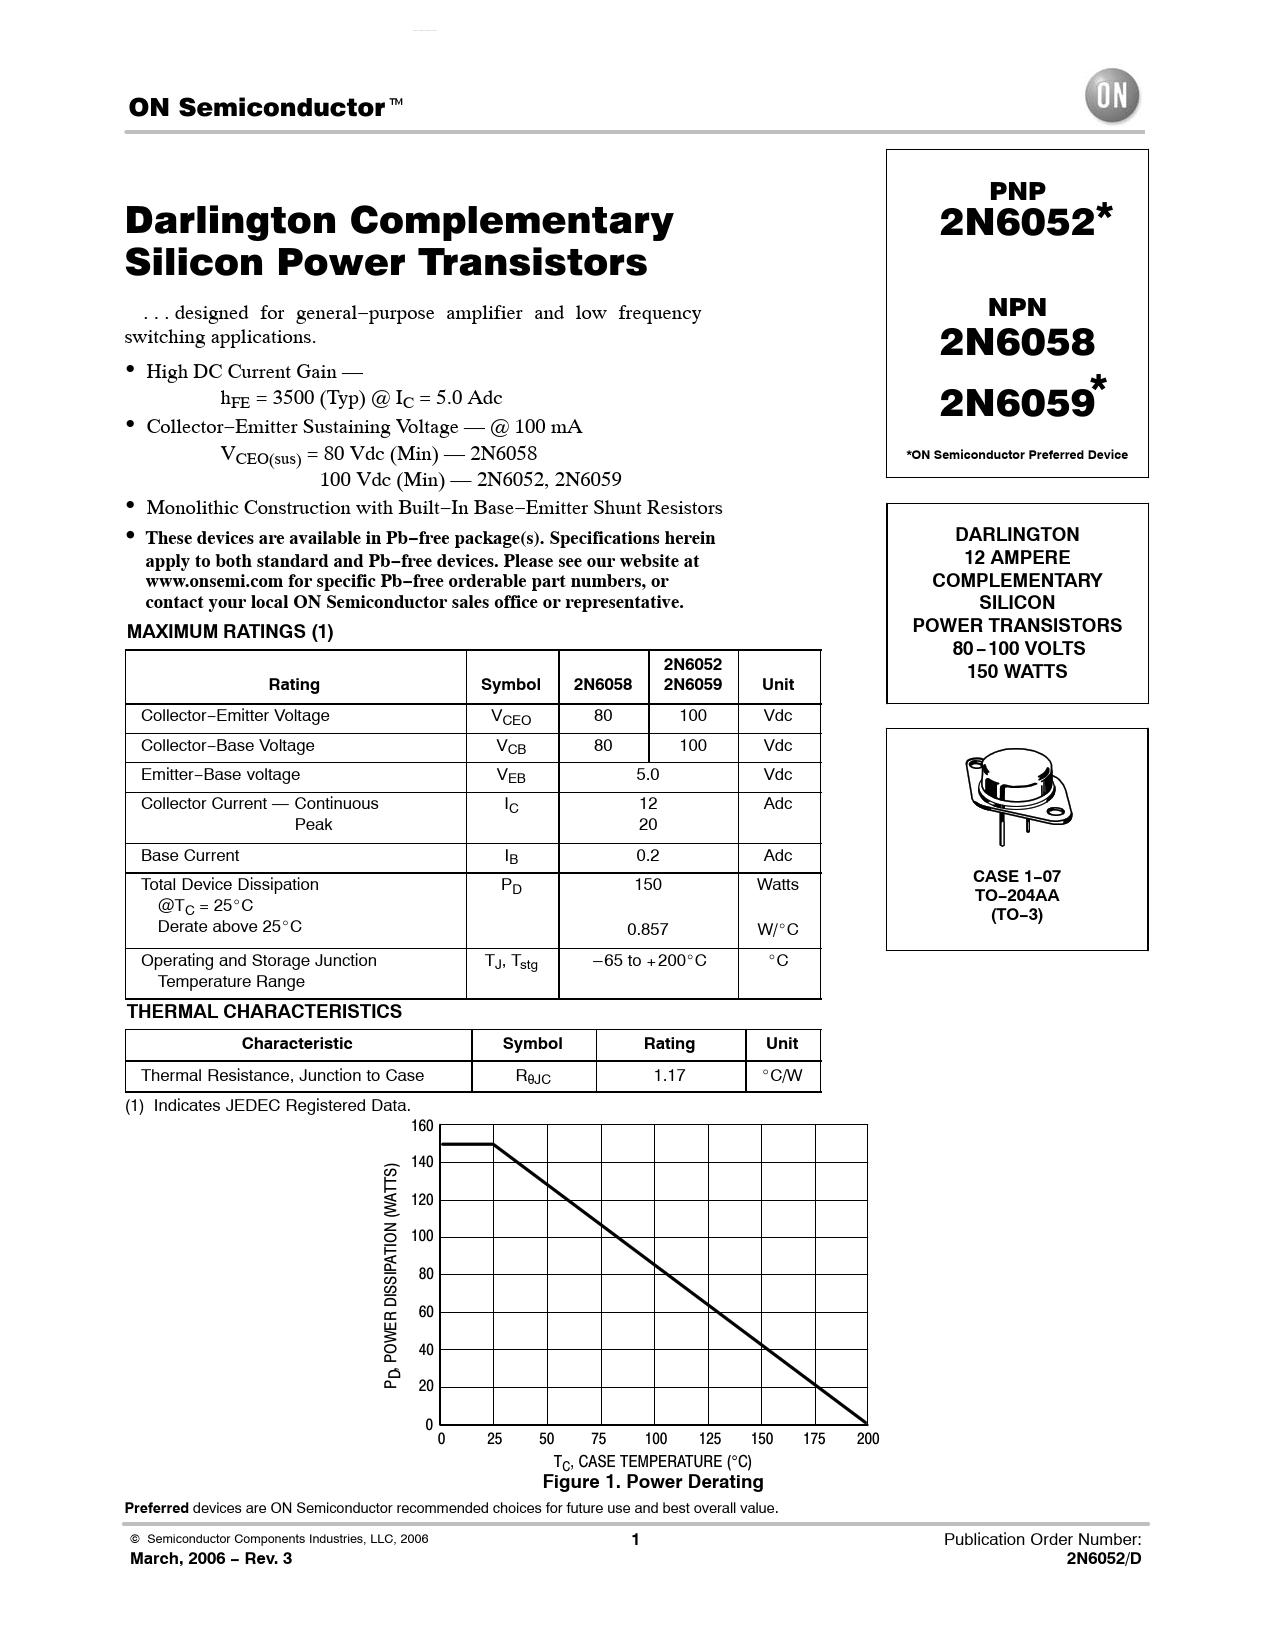 Datasheet 2N6058 ON Semiconductor